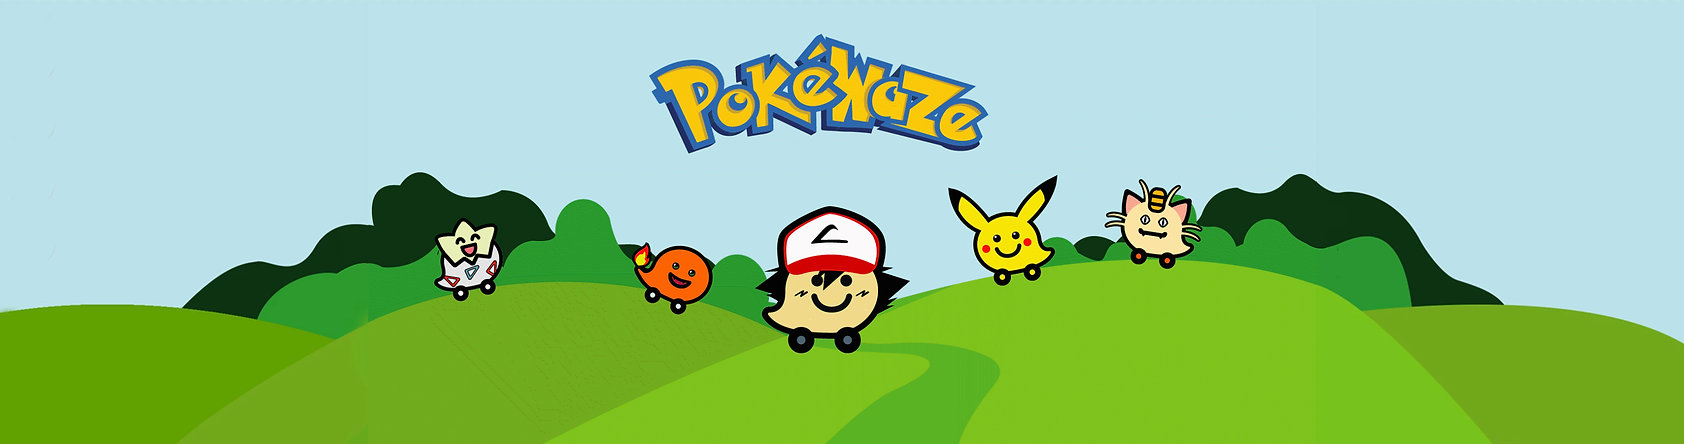 pokemon_.jpg